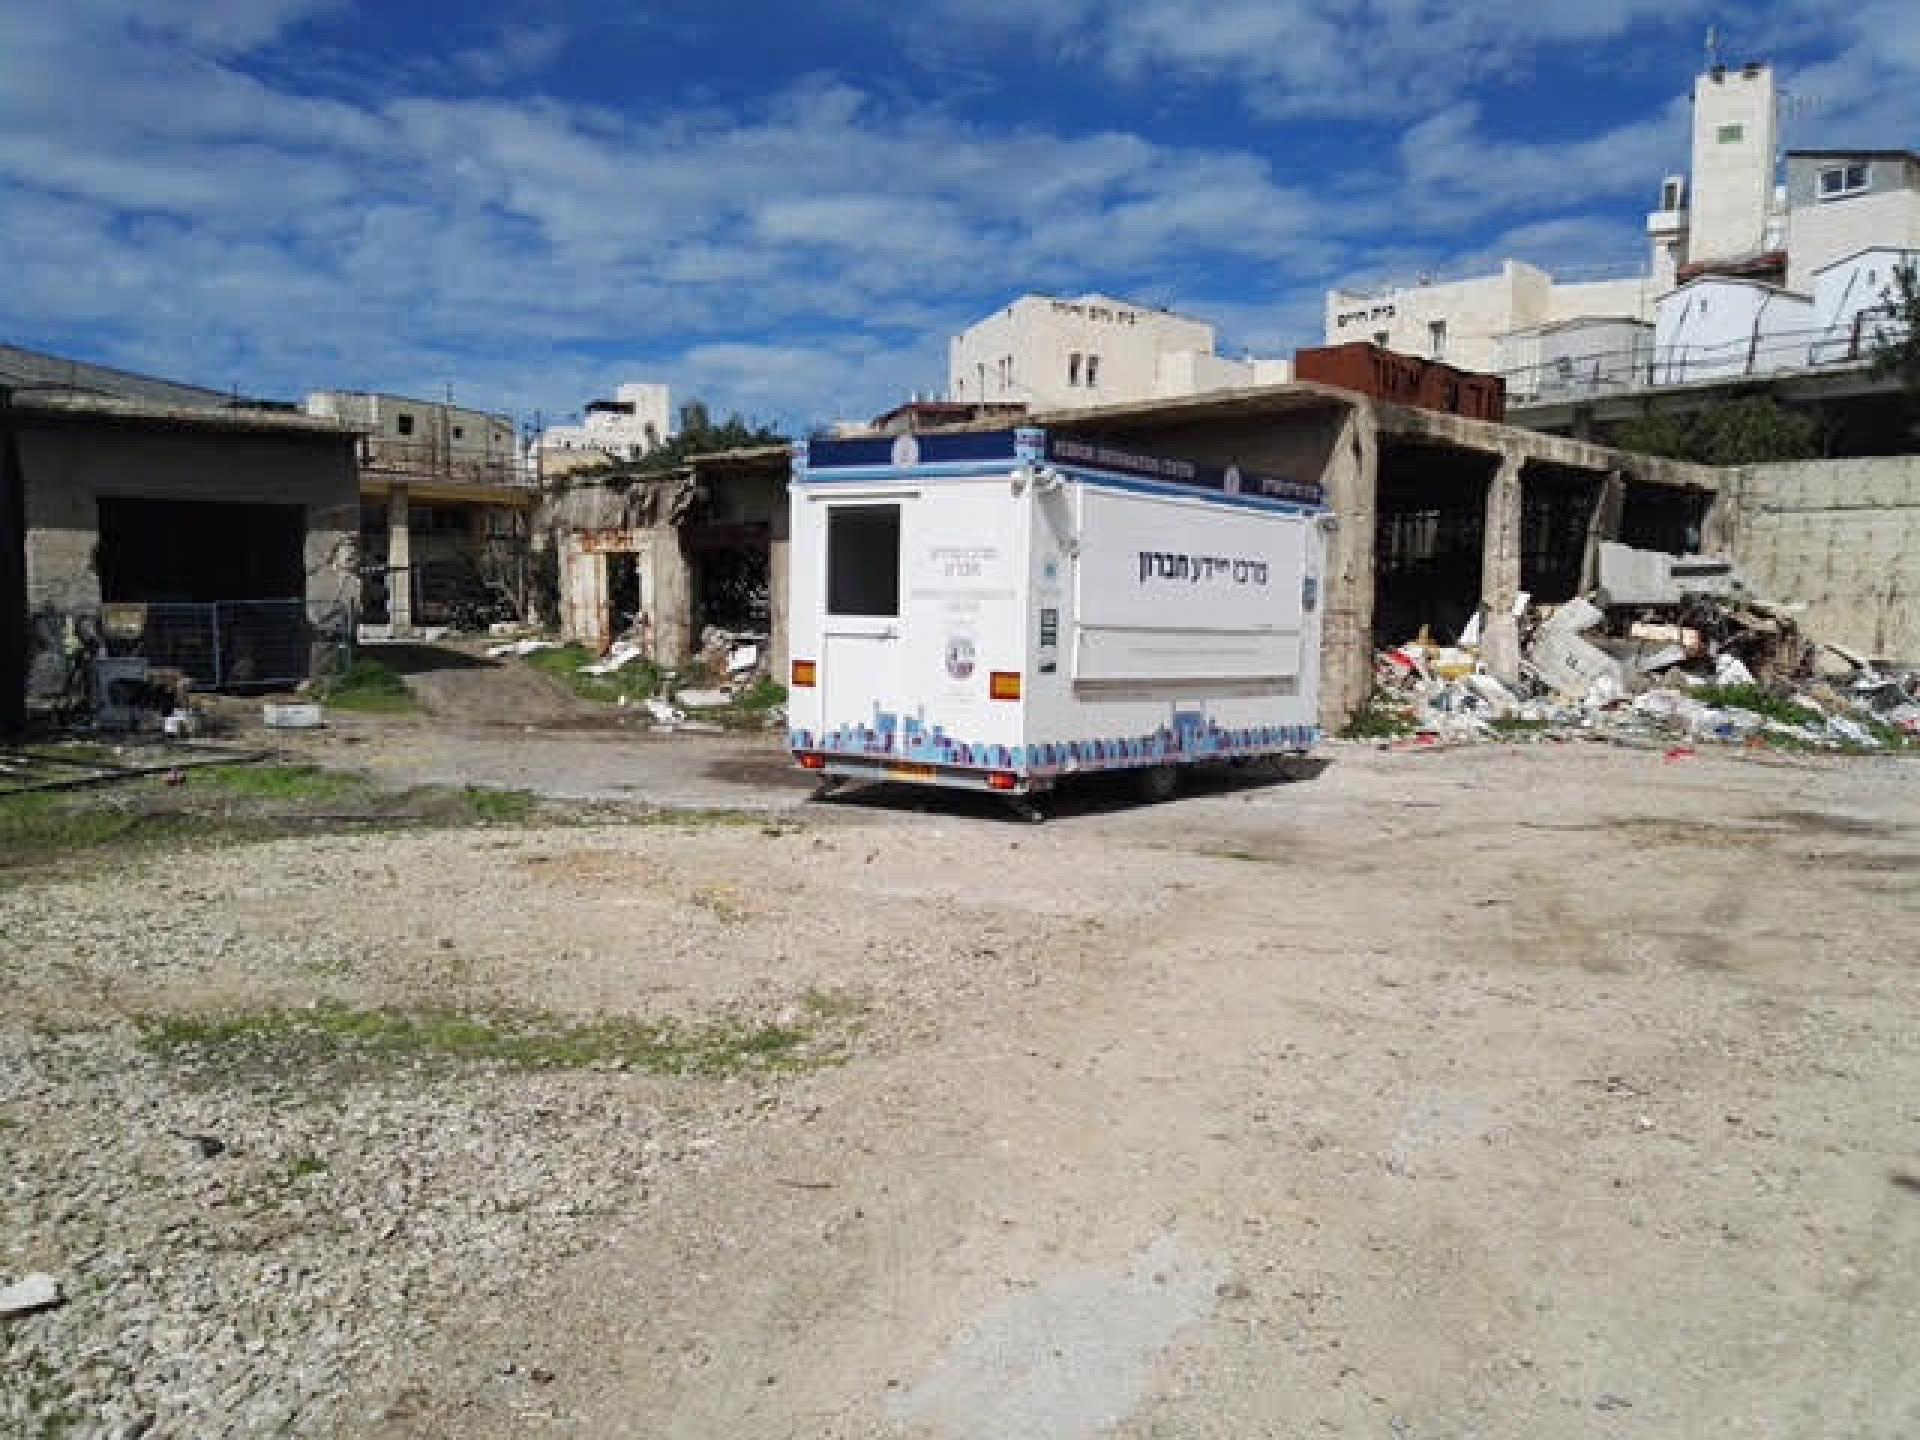 A caravan has been put at the wholesale market